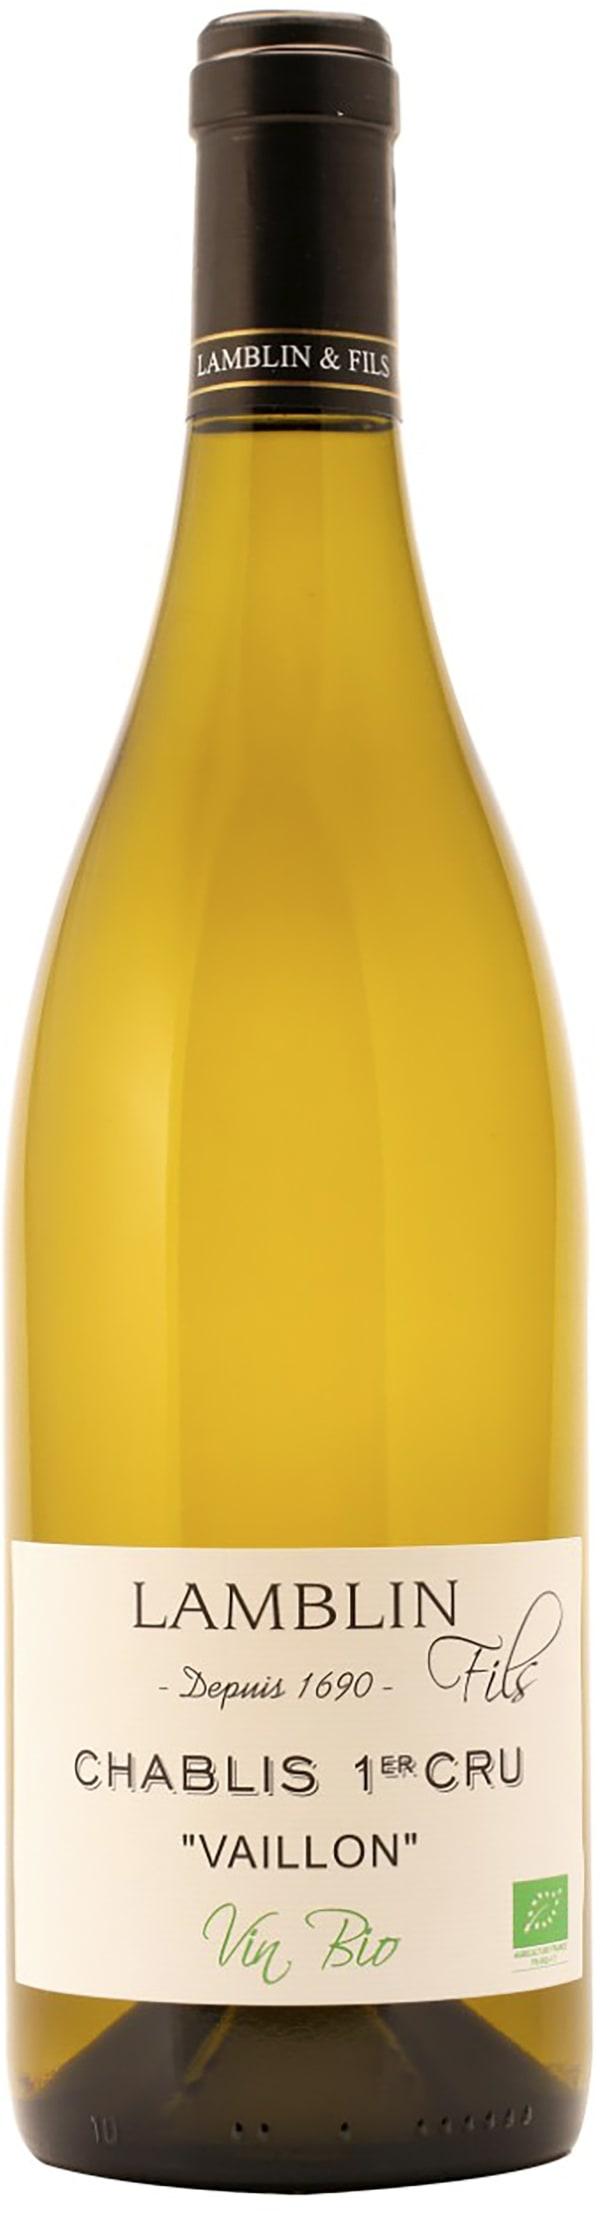 Lamblin Chablis 1er Cru Vaillon Vin Bio 2018